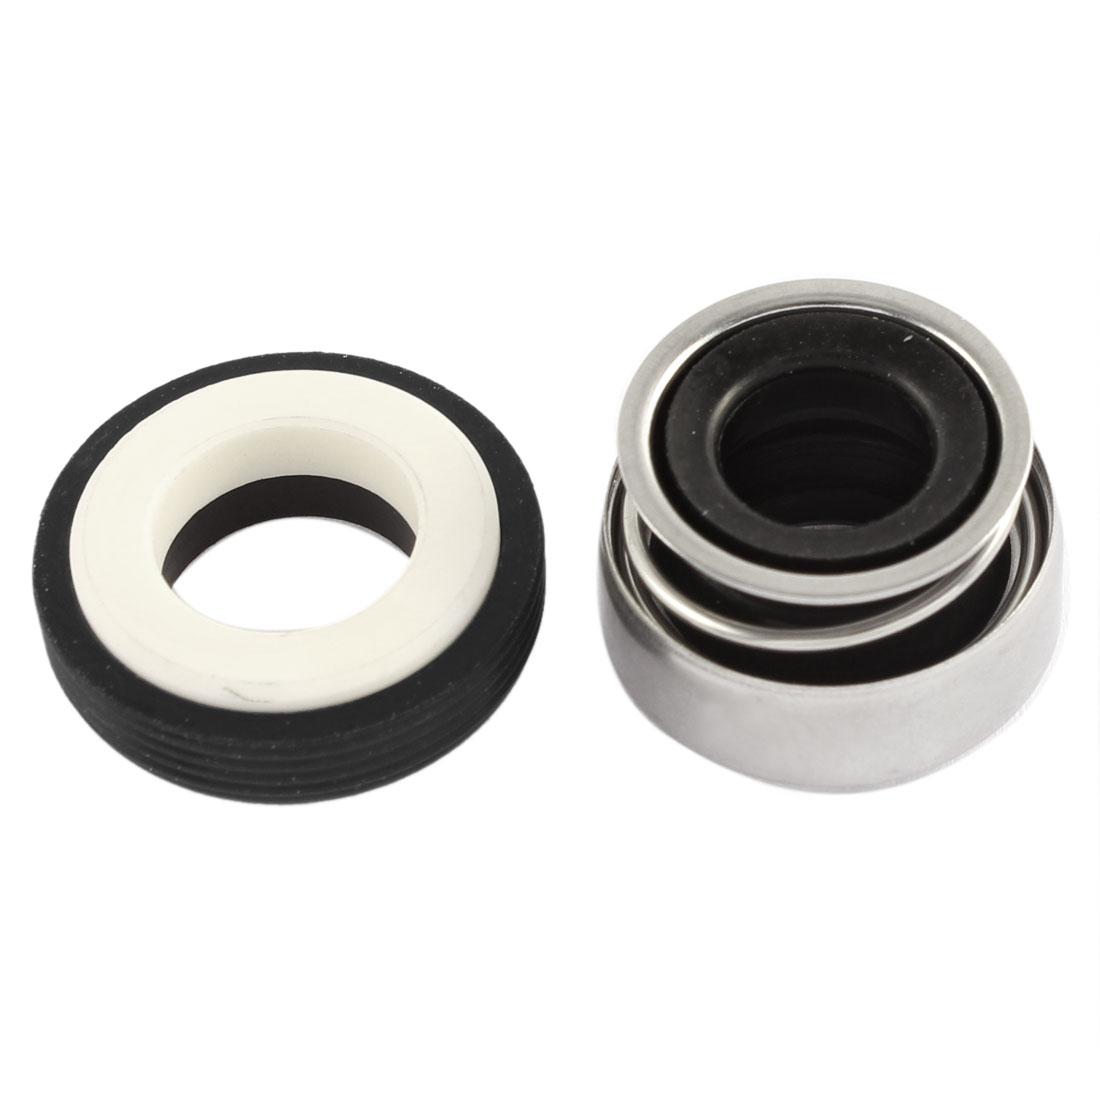 12mm Internal Diameter Round Single Coil Spring Water Pump shaft Mechanical Seal